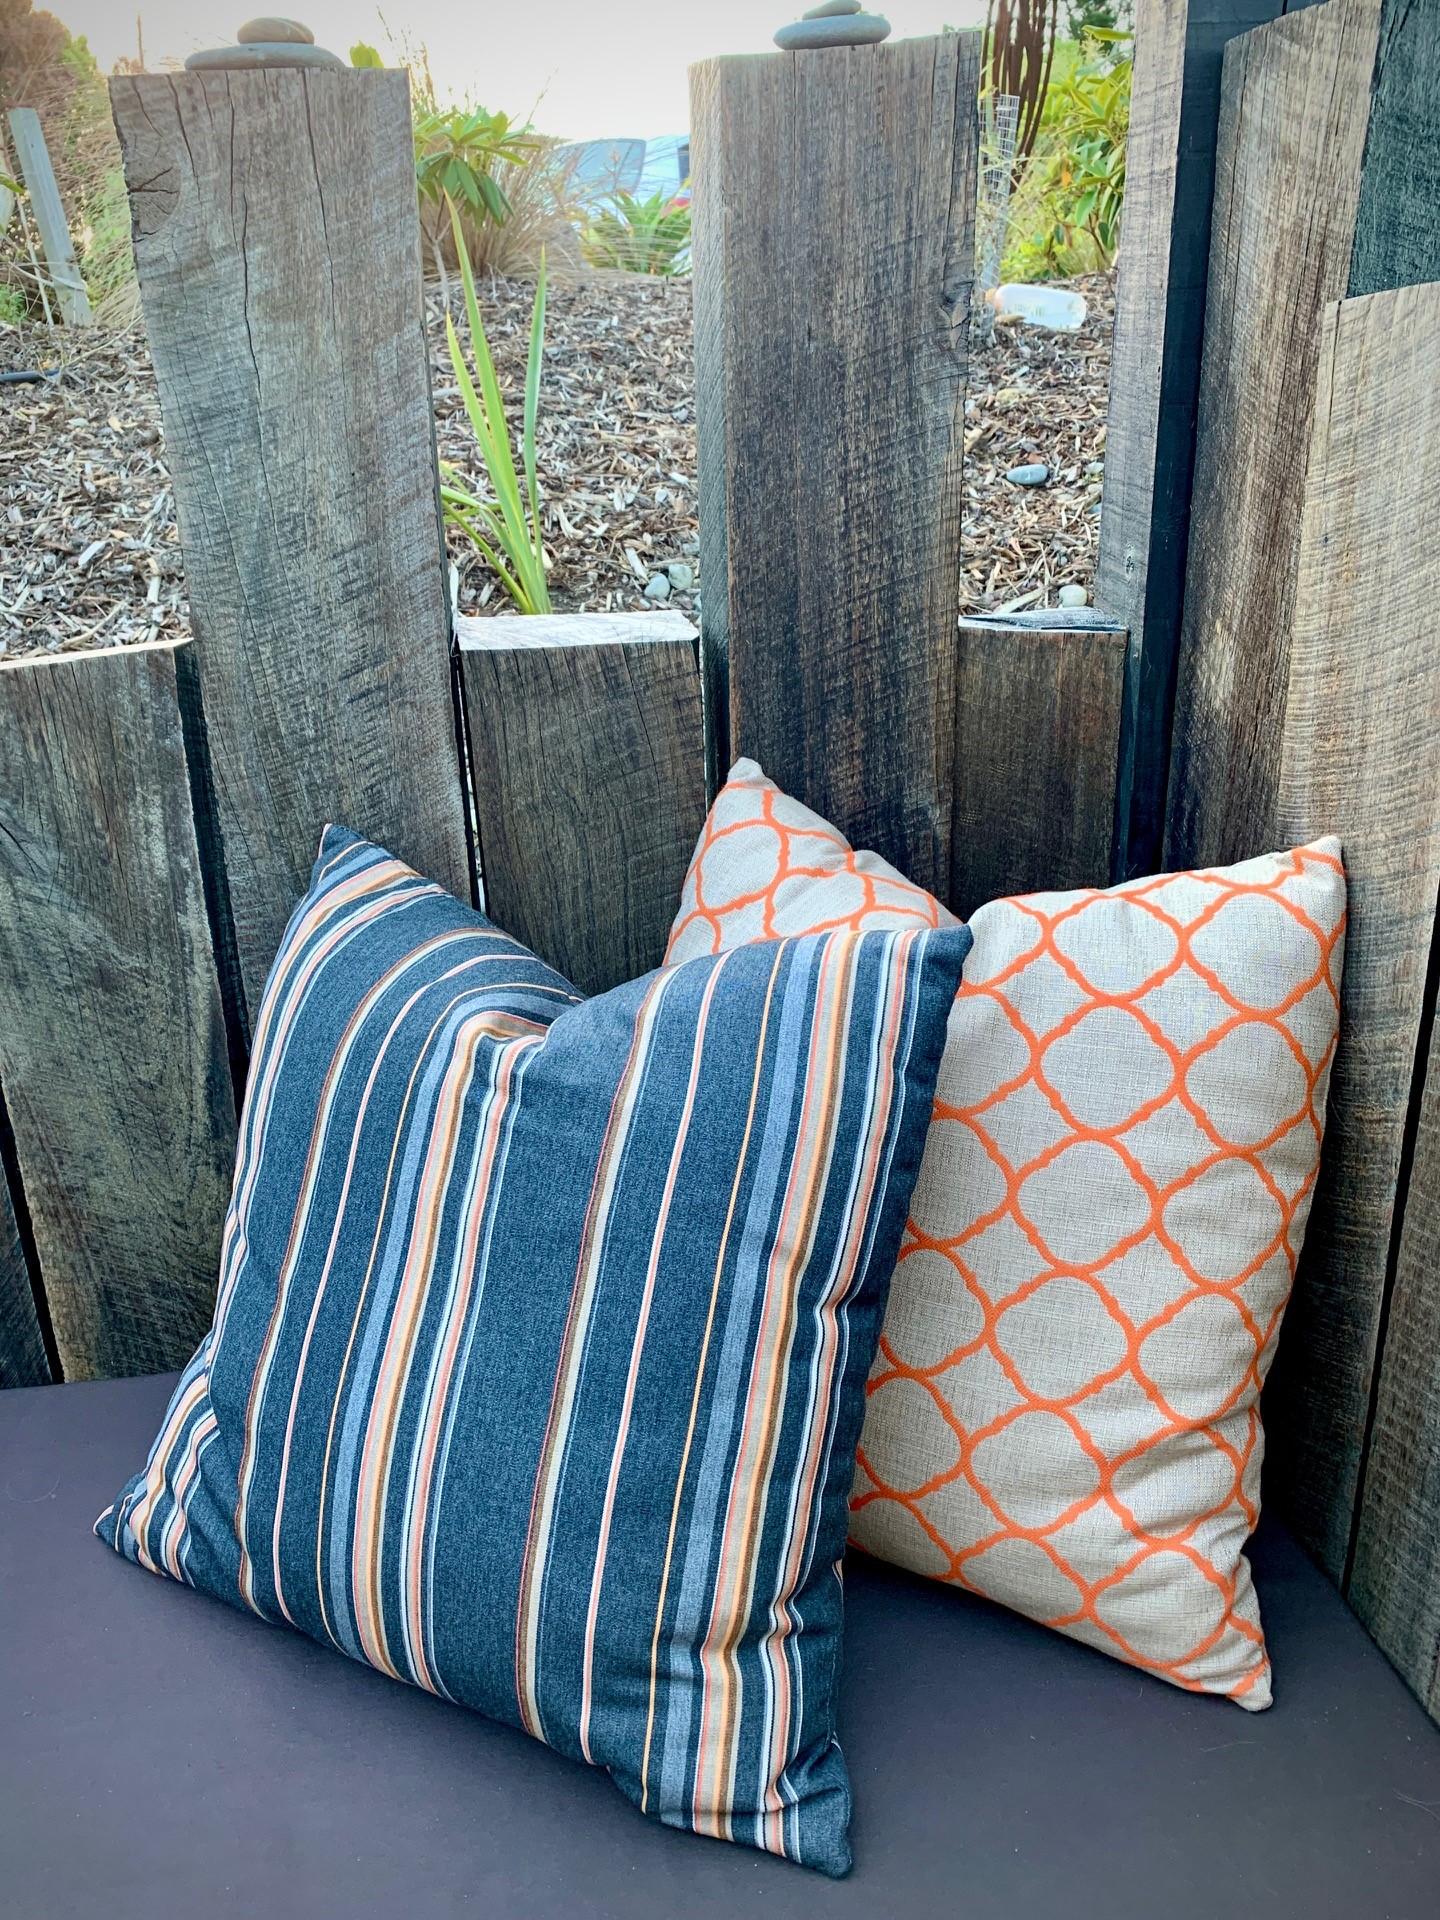 Sunbrella Outdoor Cushions